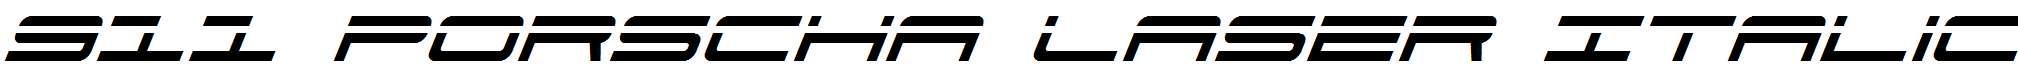 911-Porscha-Laser-Italic-copy-1